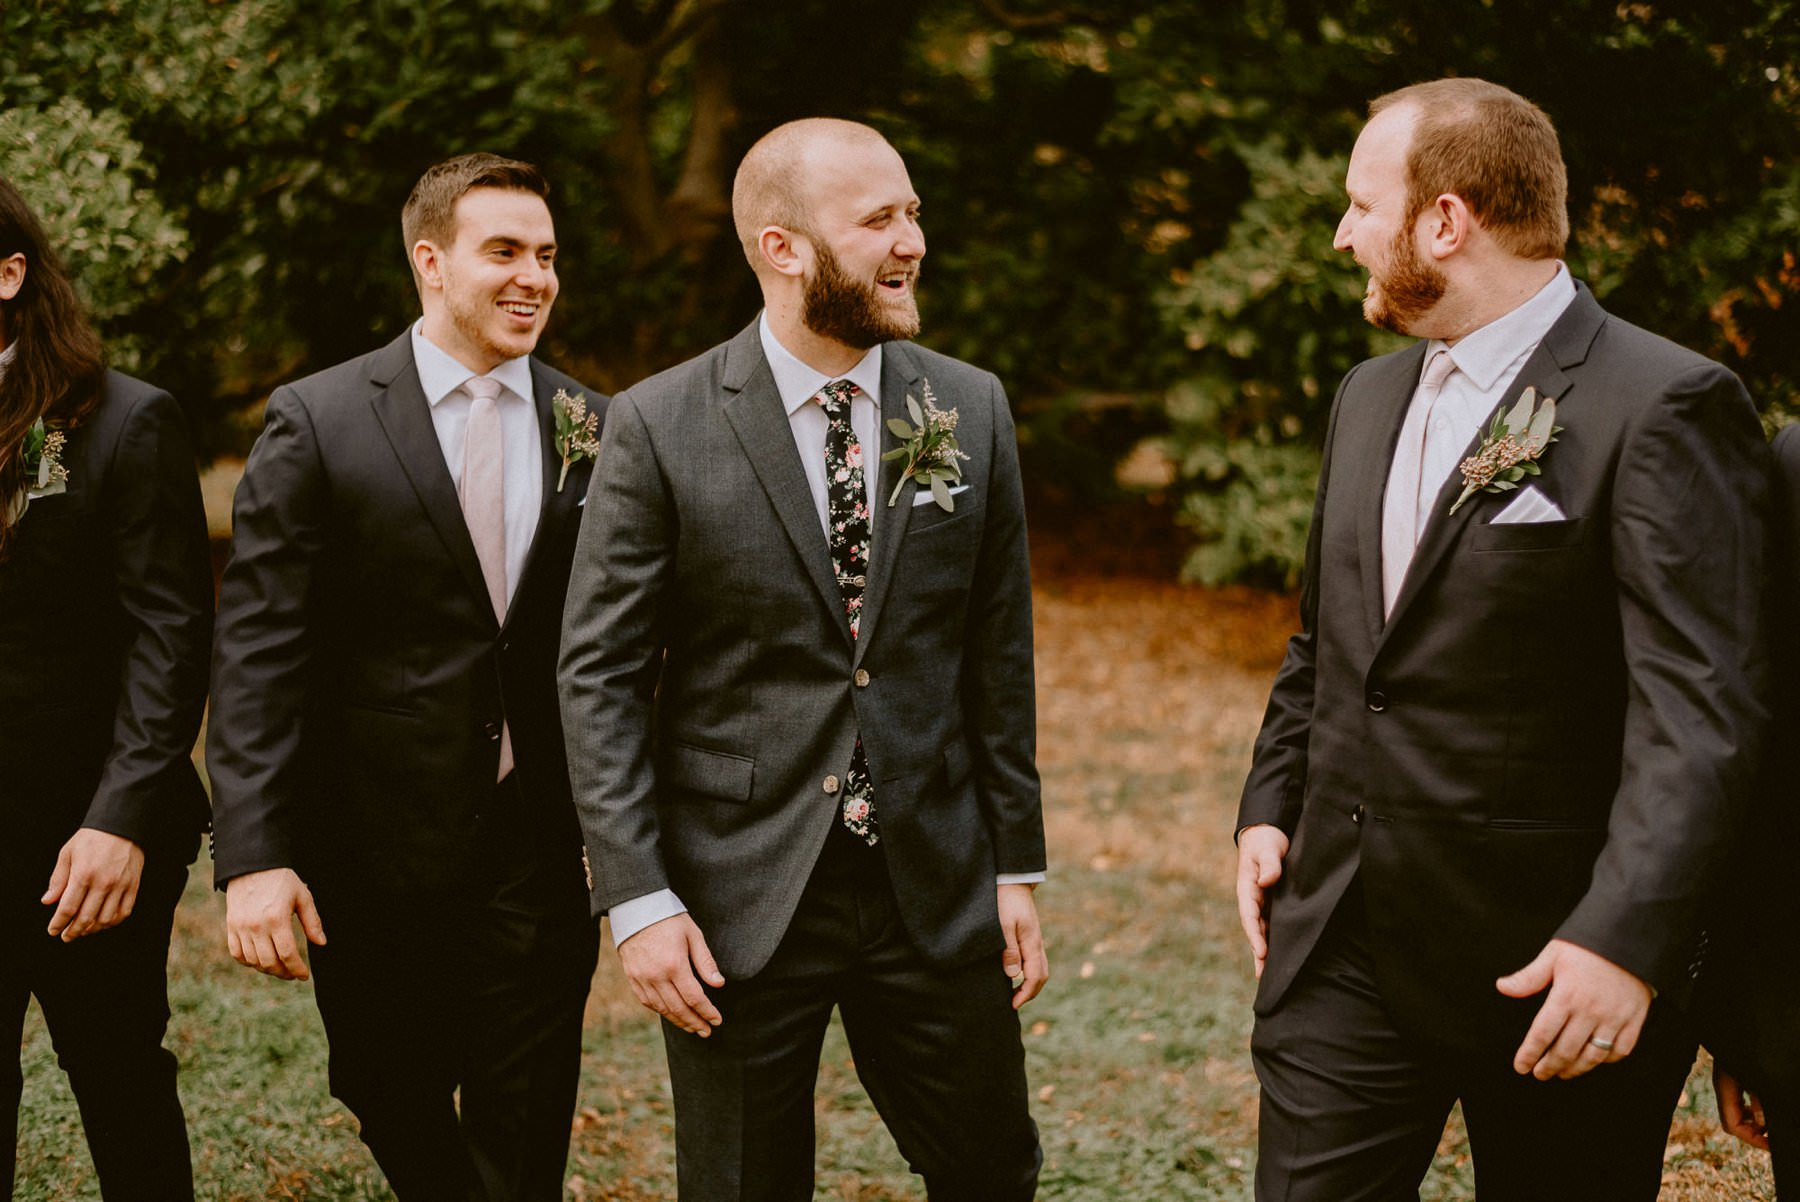 Tyler_arboretum_wedding-021.jpg